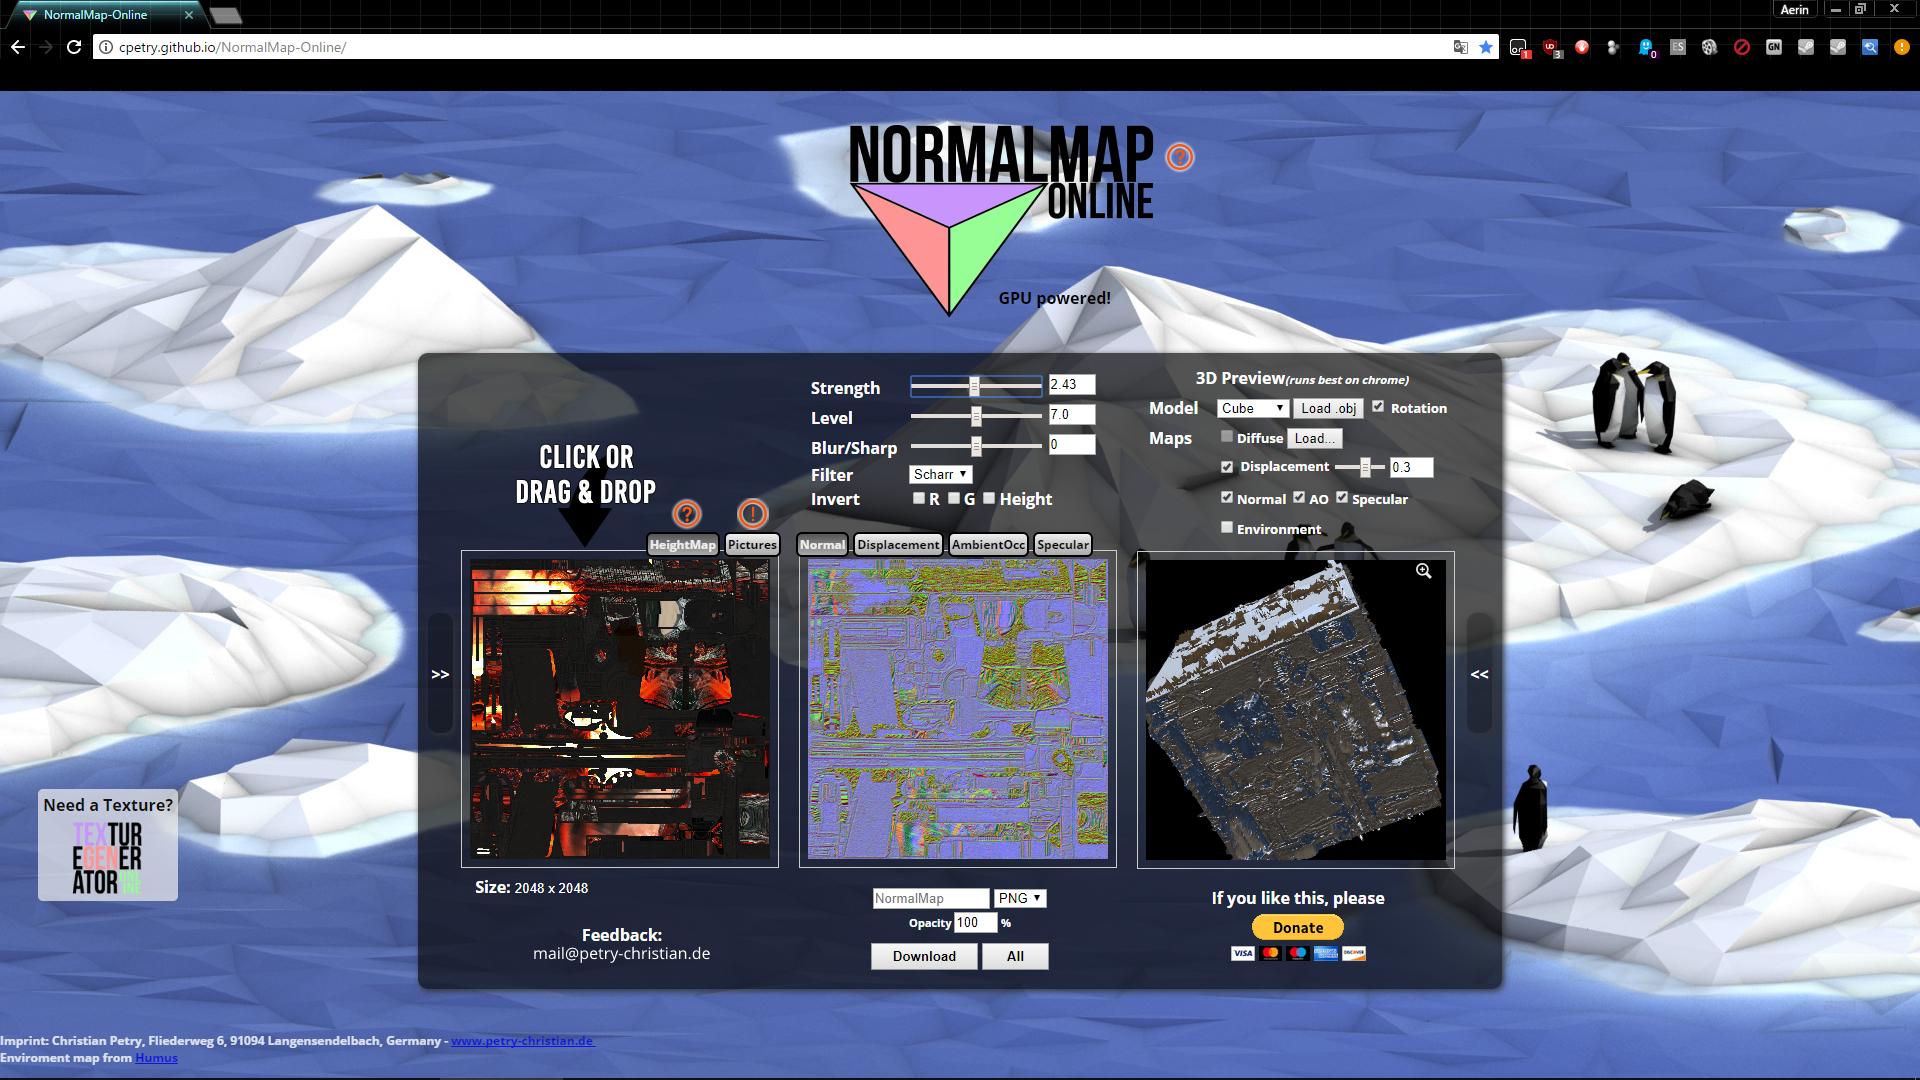 Steam Community :: Guide :: Killing Floor 2 - How to Export 3D model